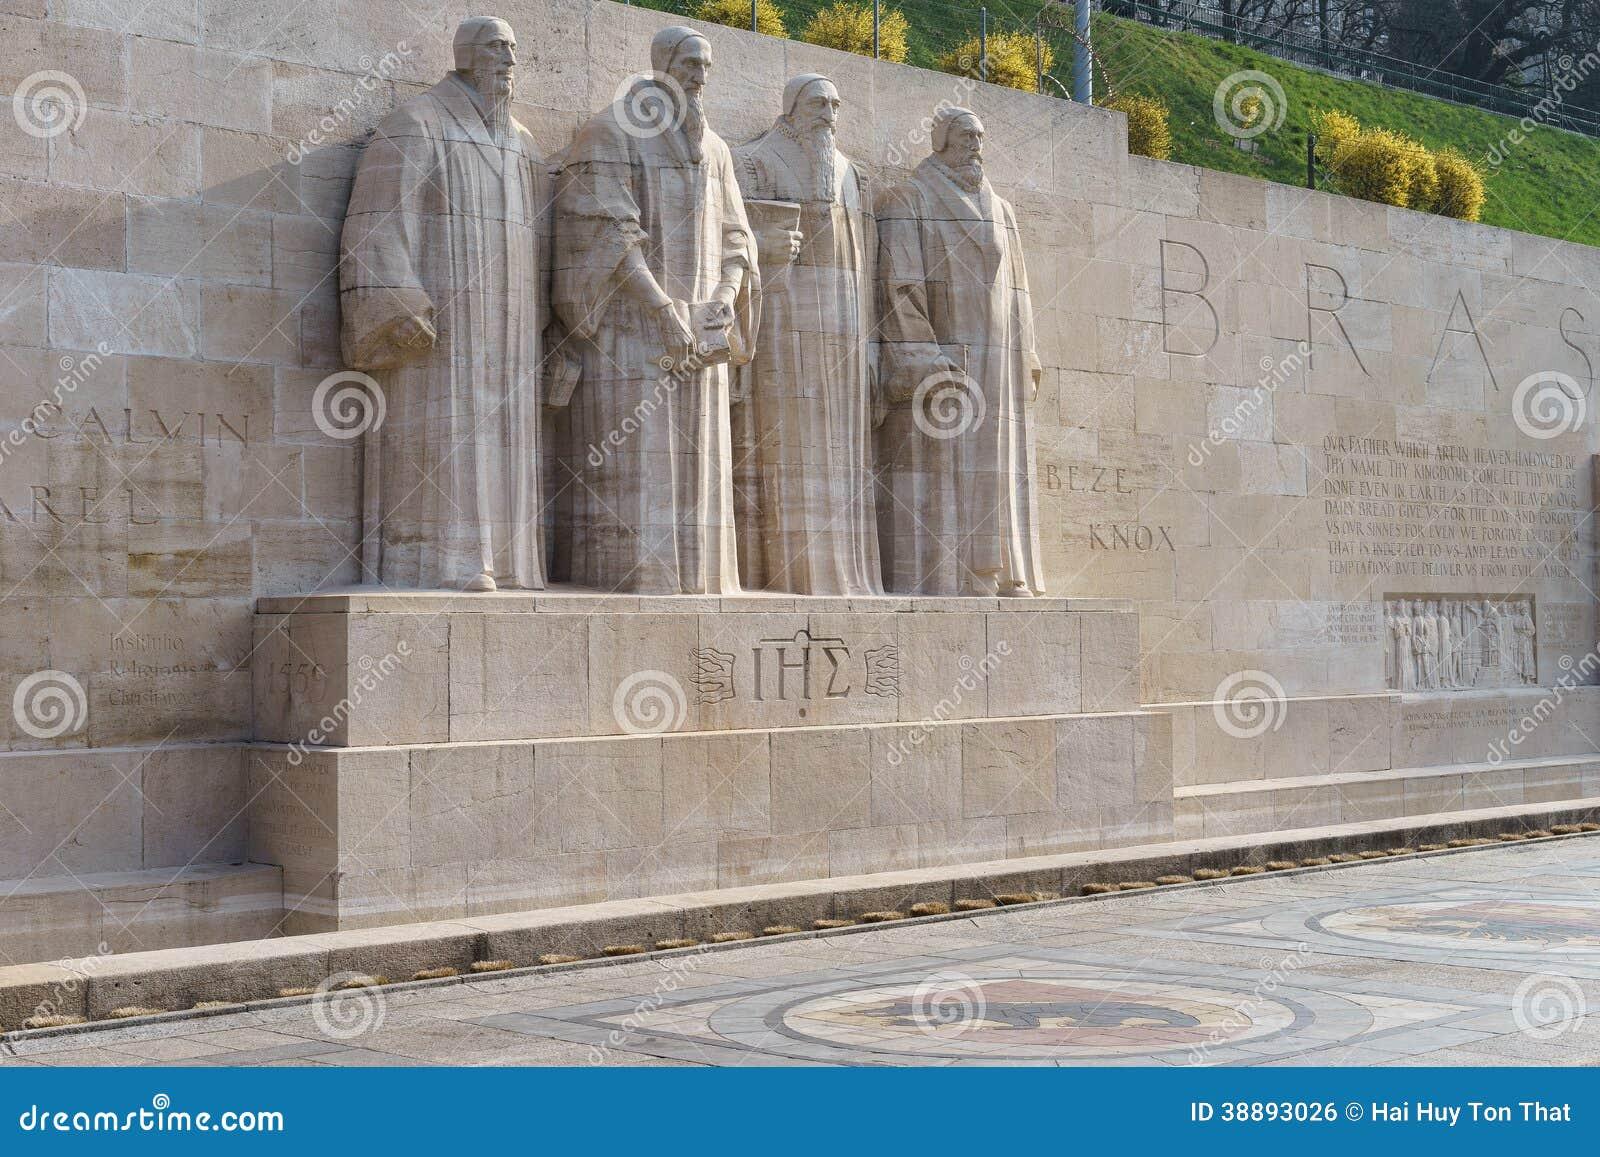 Reformation Wall In Geneva Stock Photo Image 38893026